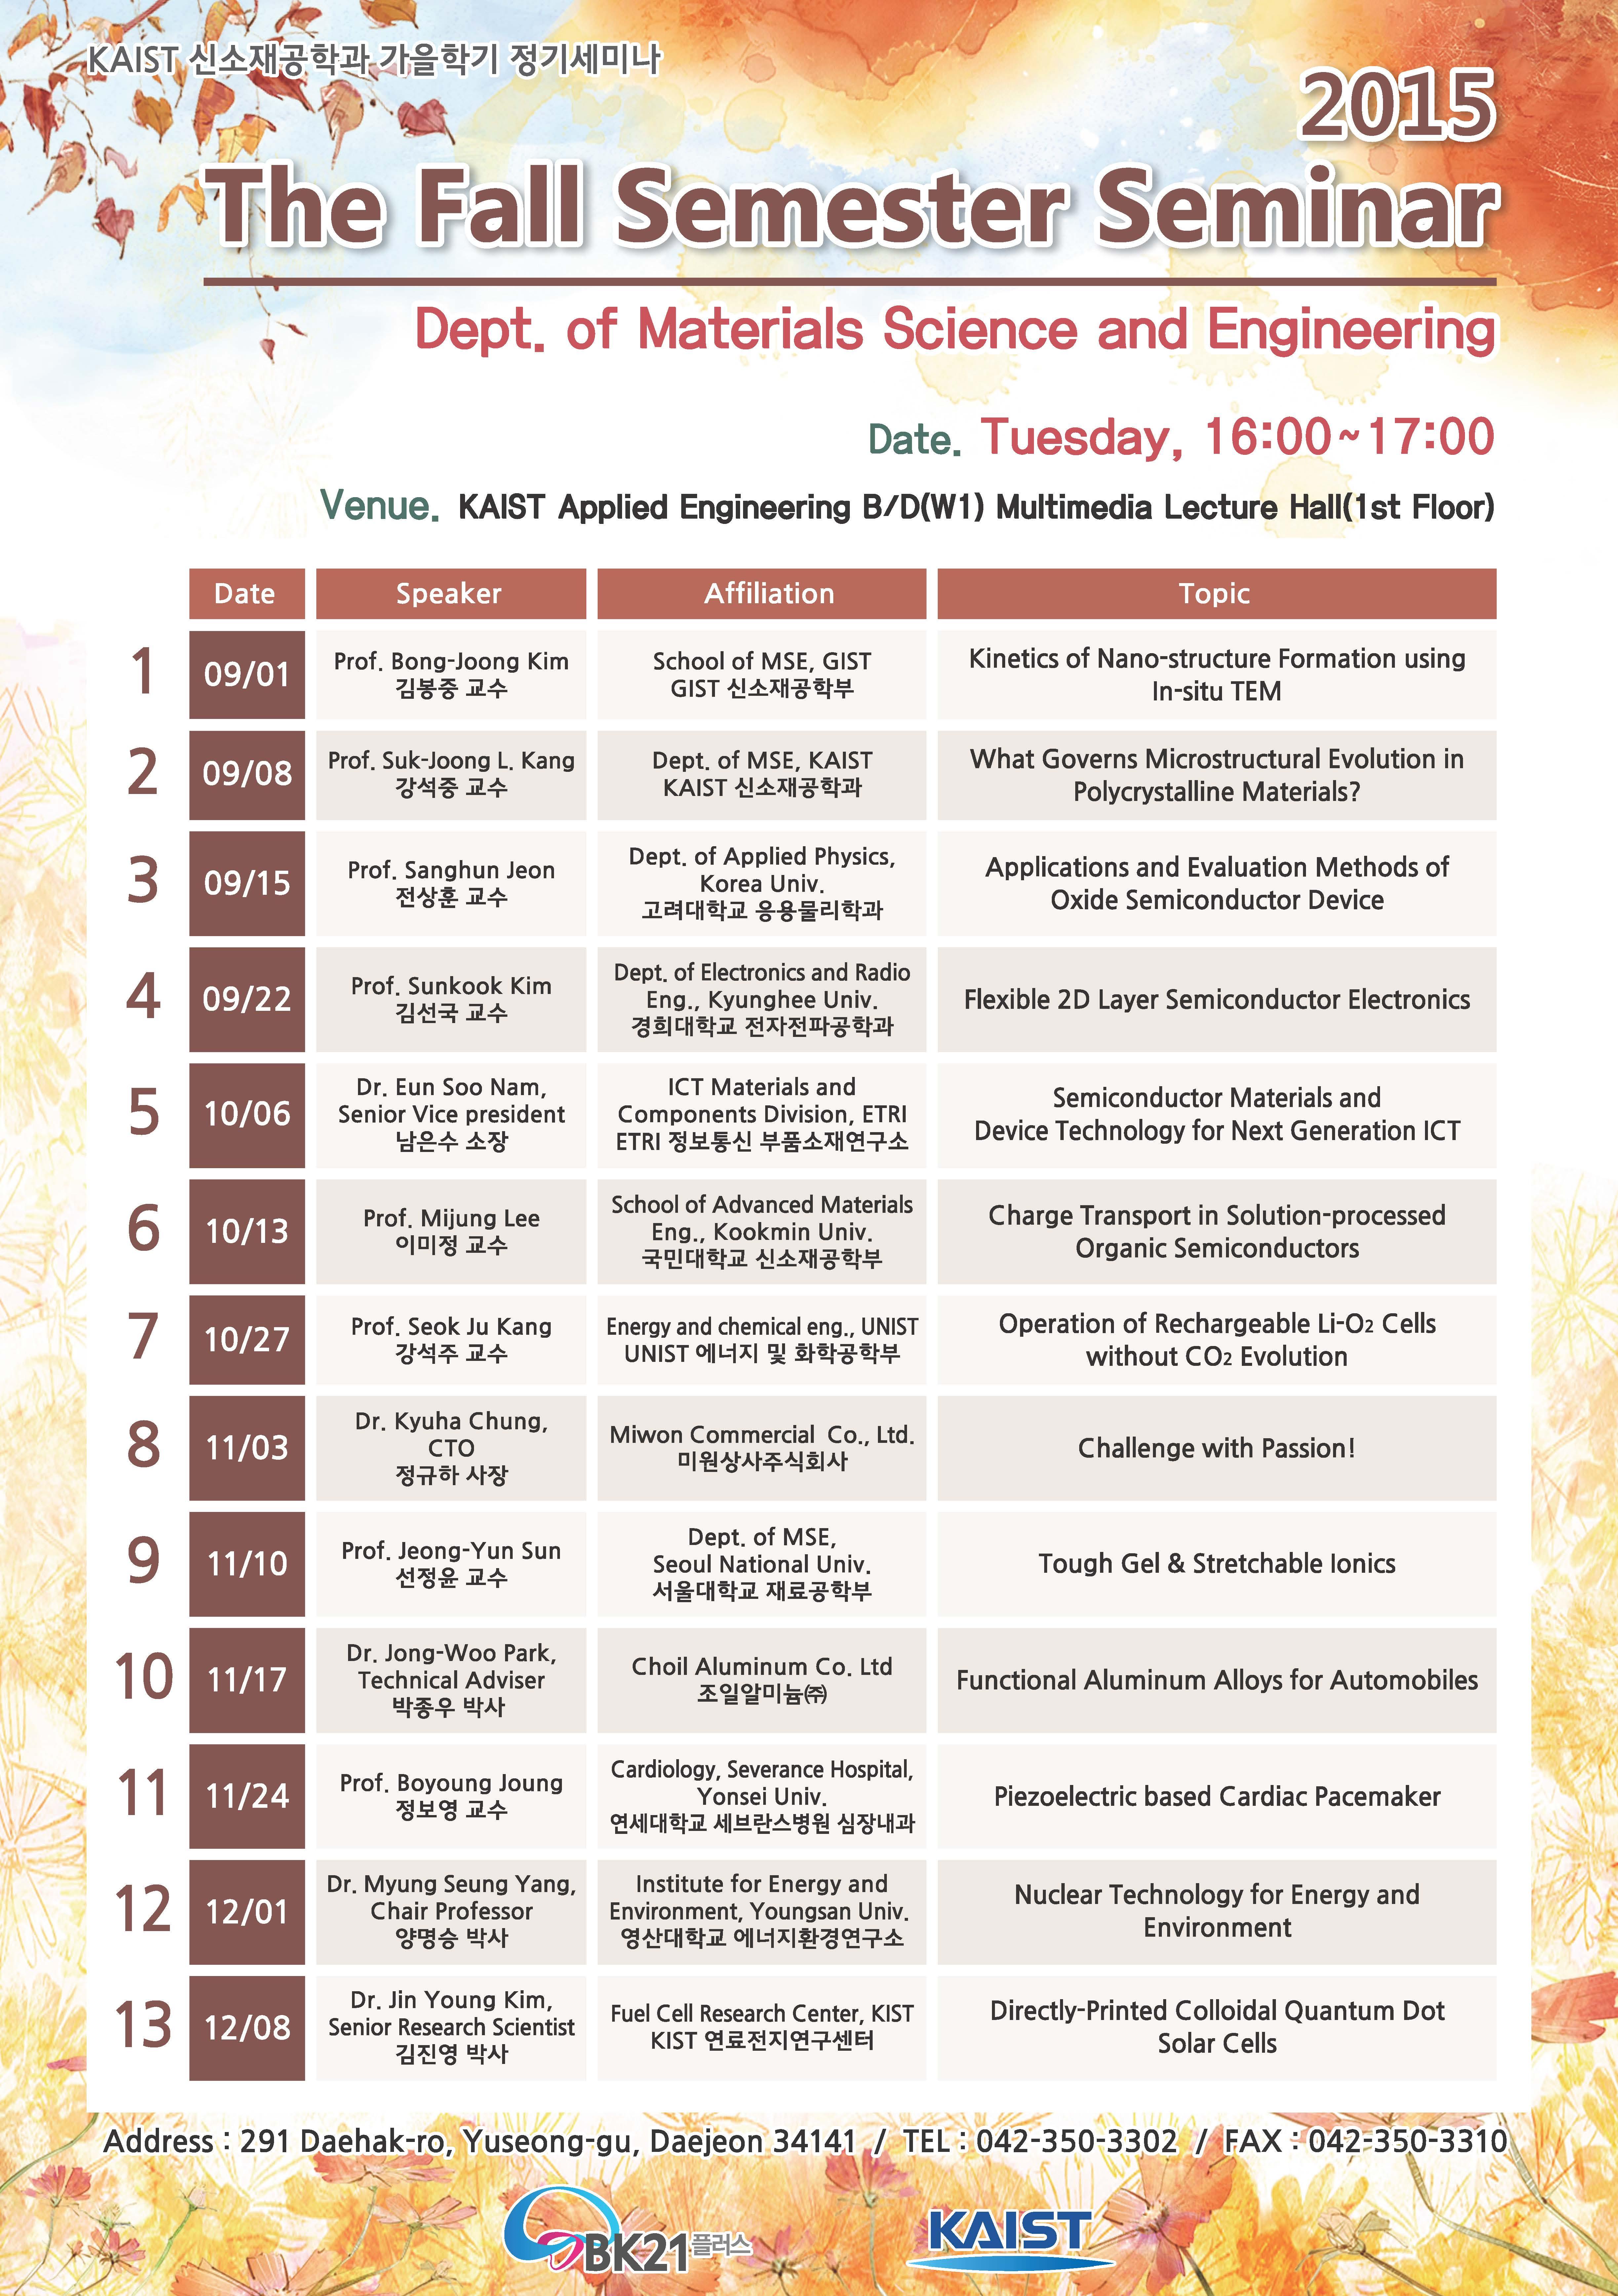 150825_2015 The Fall Semester Seminar_포스터수정-최종.jpg